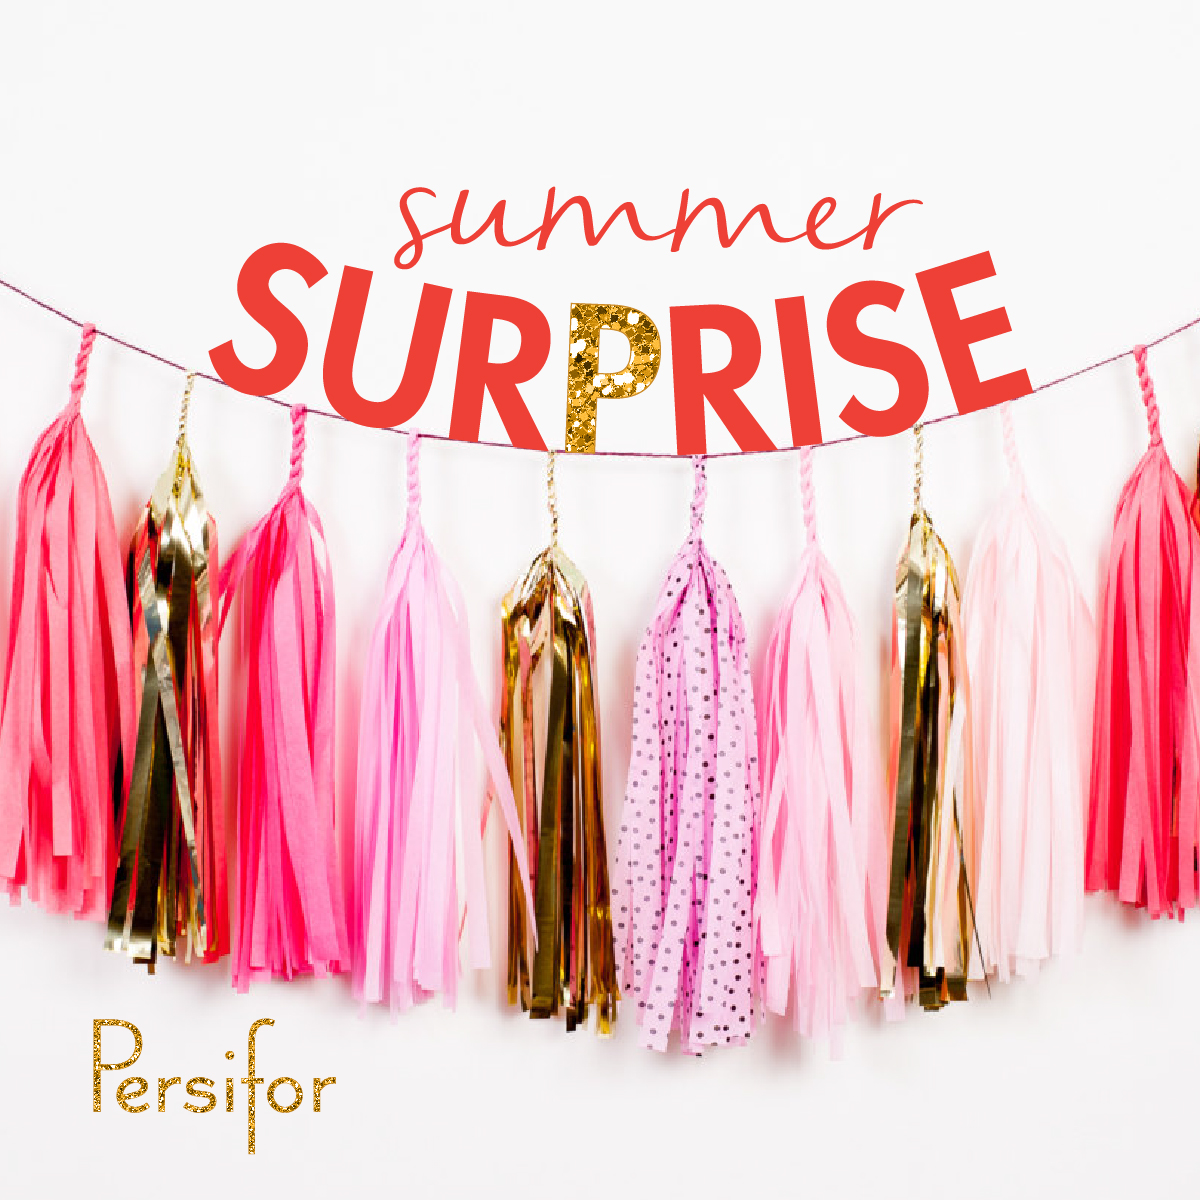 Summer Surprise-01.jpg